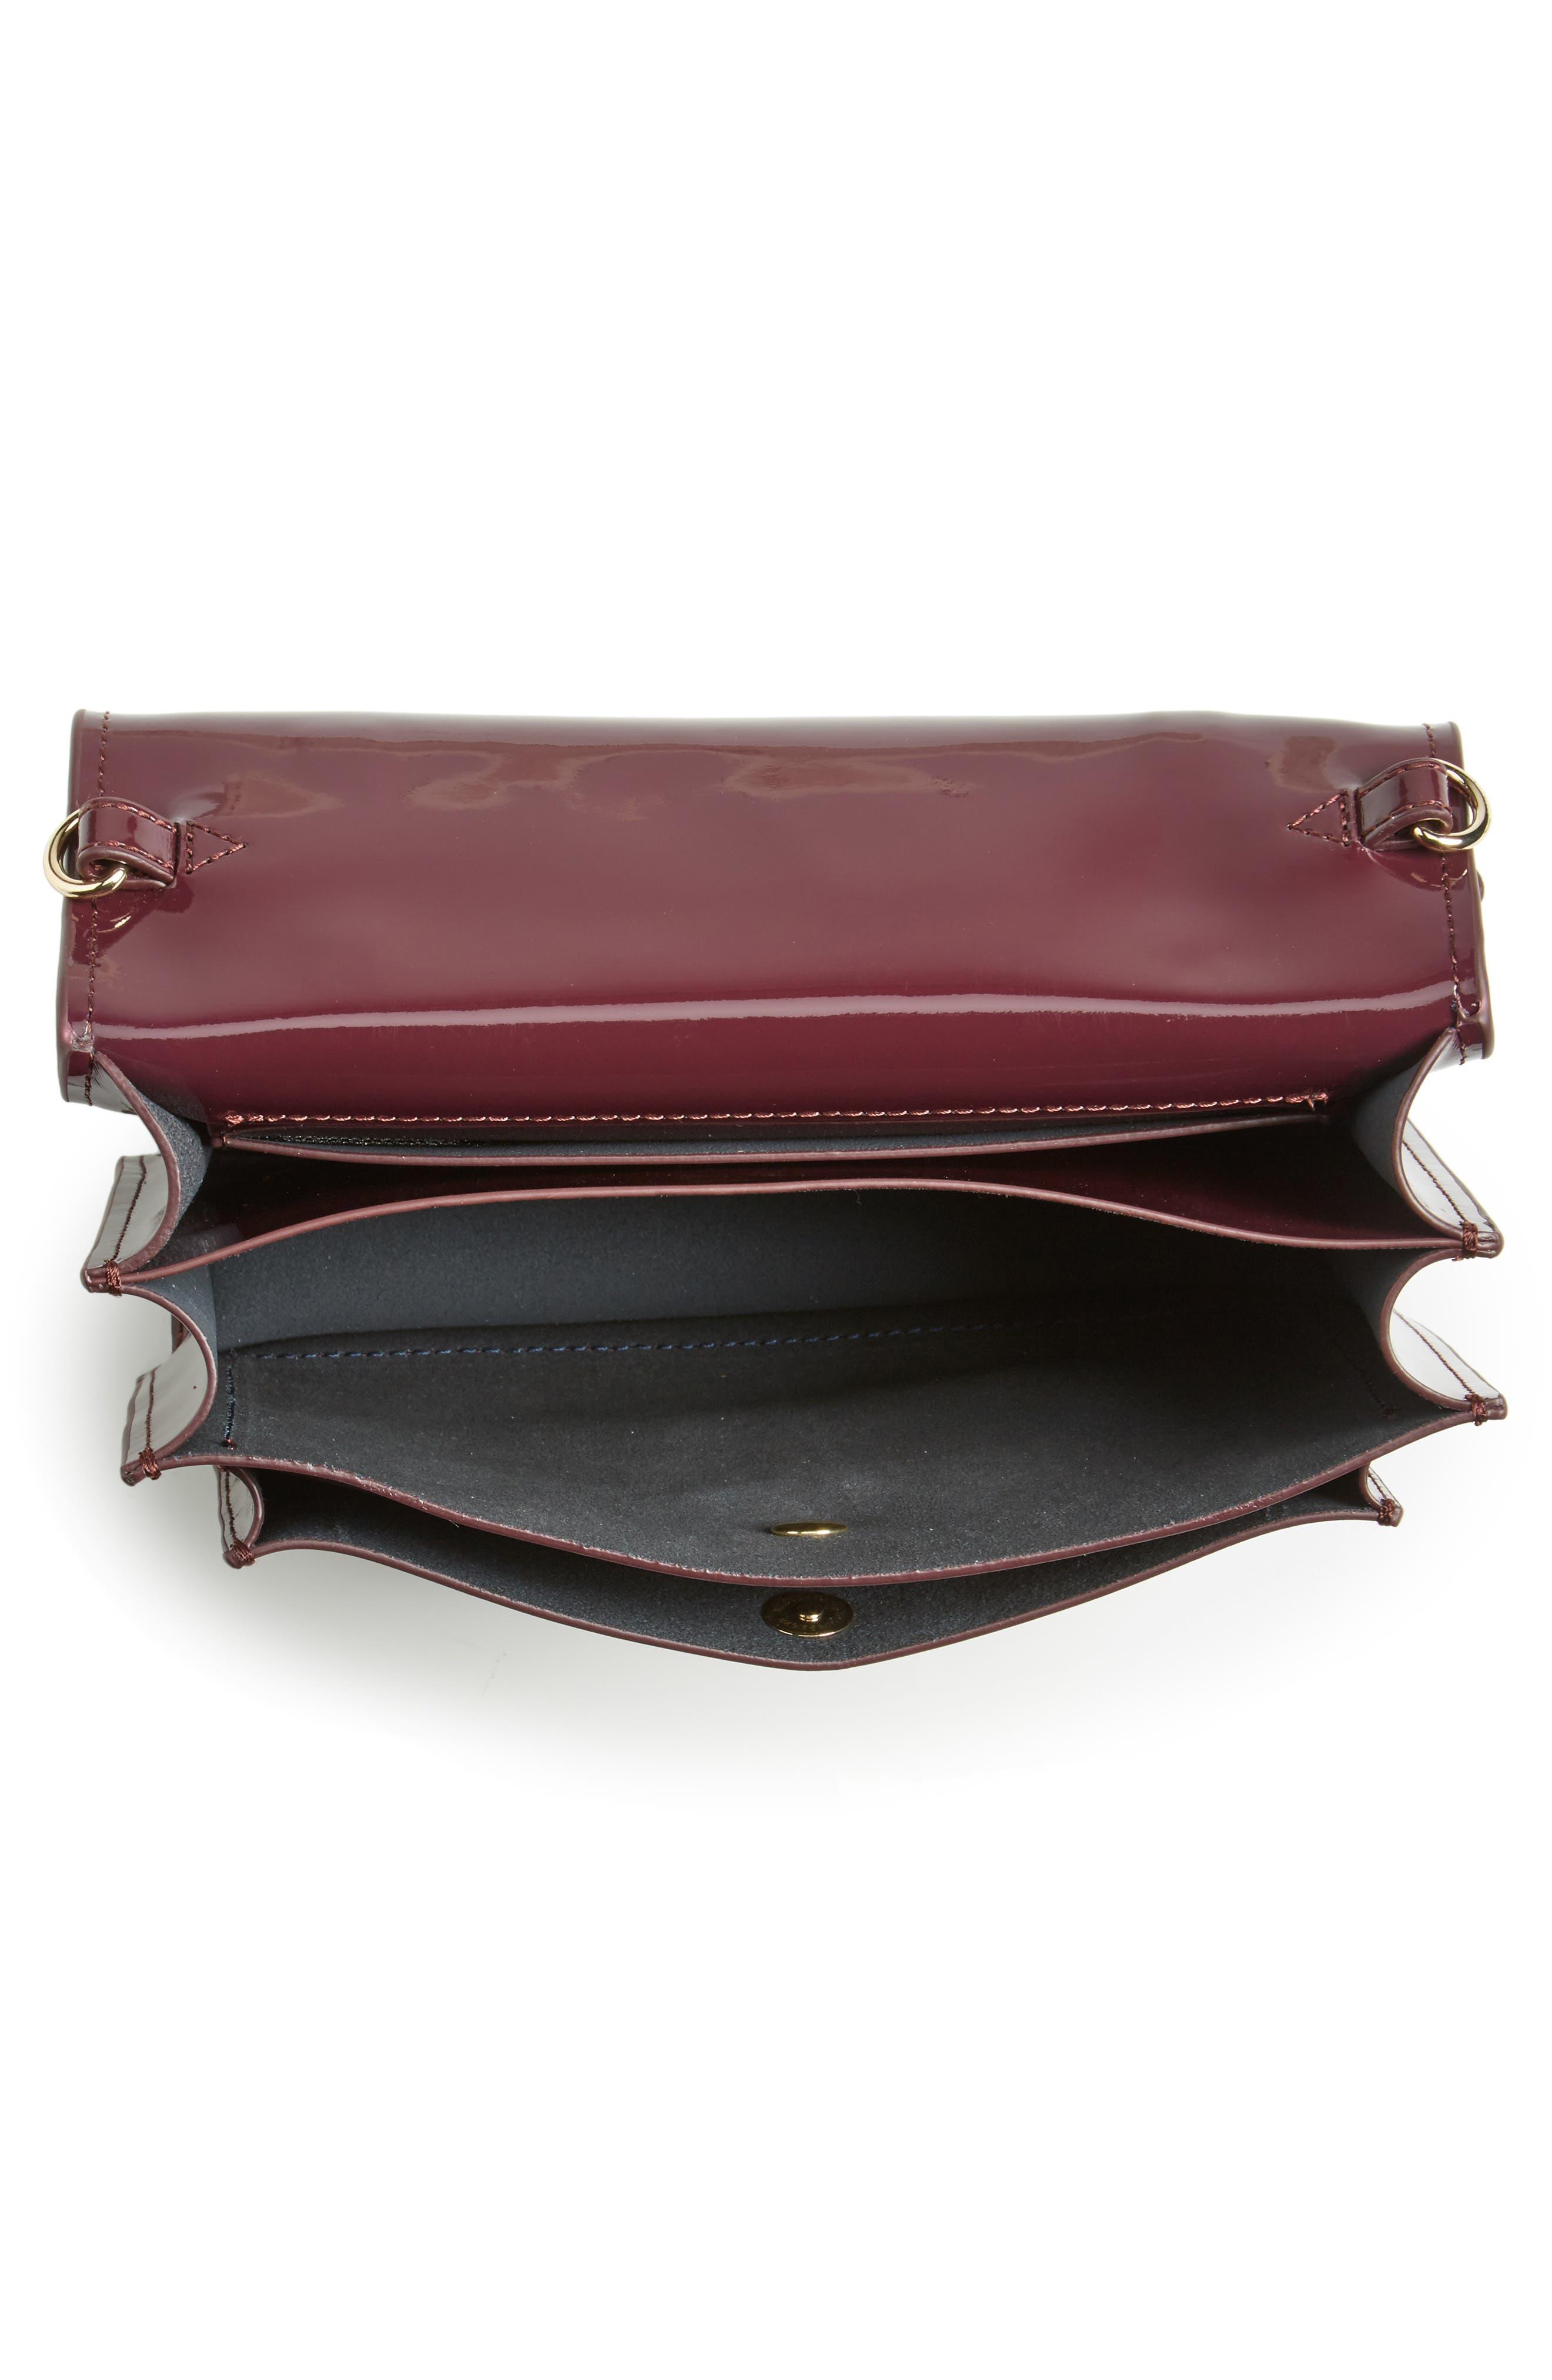 Alternate Image 3  - ZAC Zac Posen Earthette Patent Leather Accordion Bag